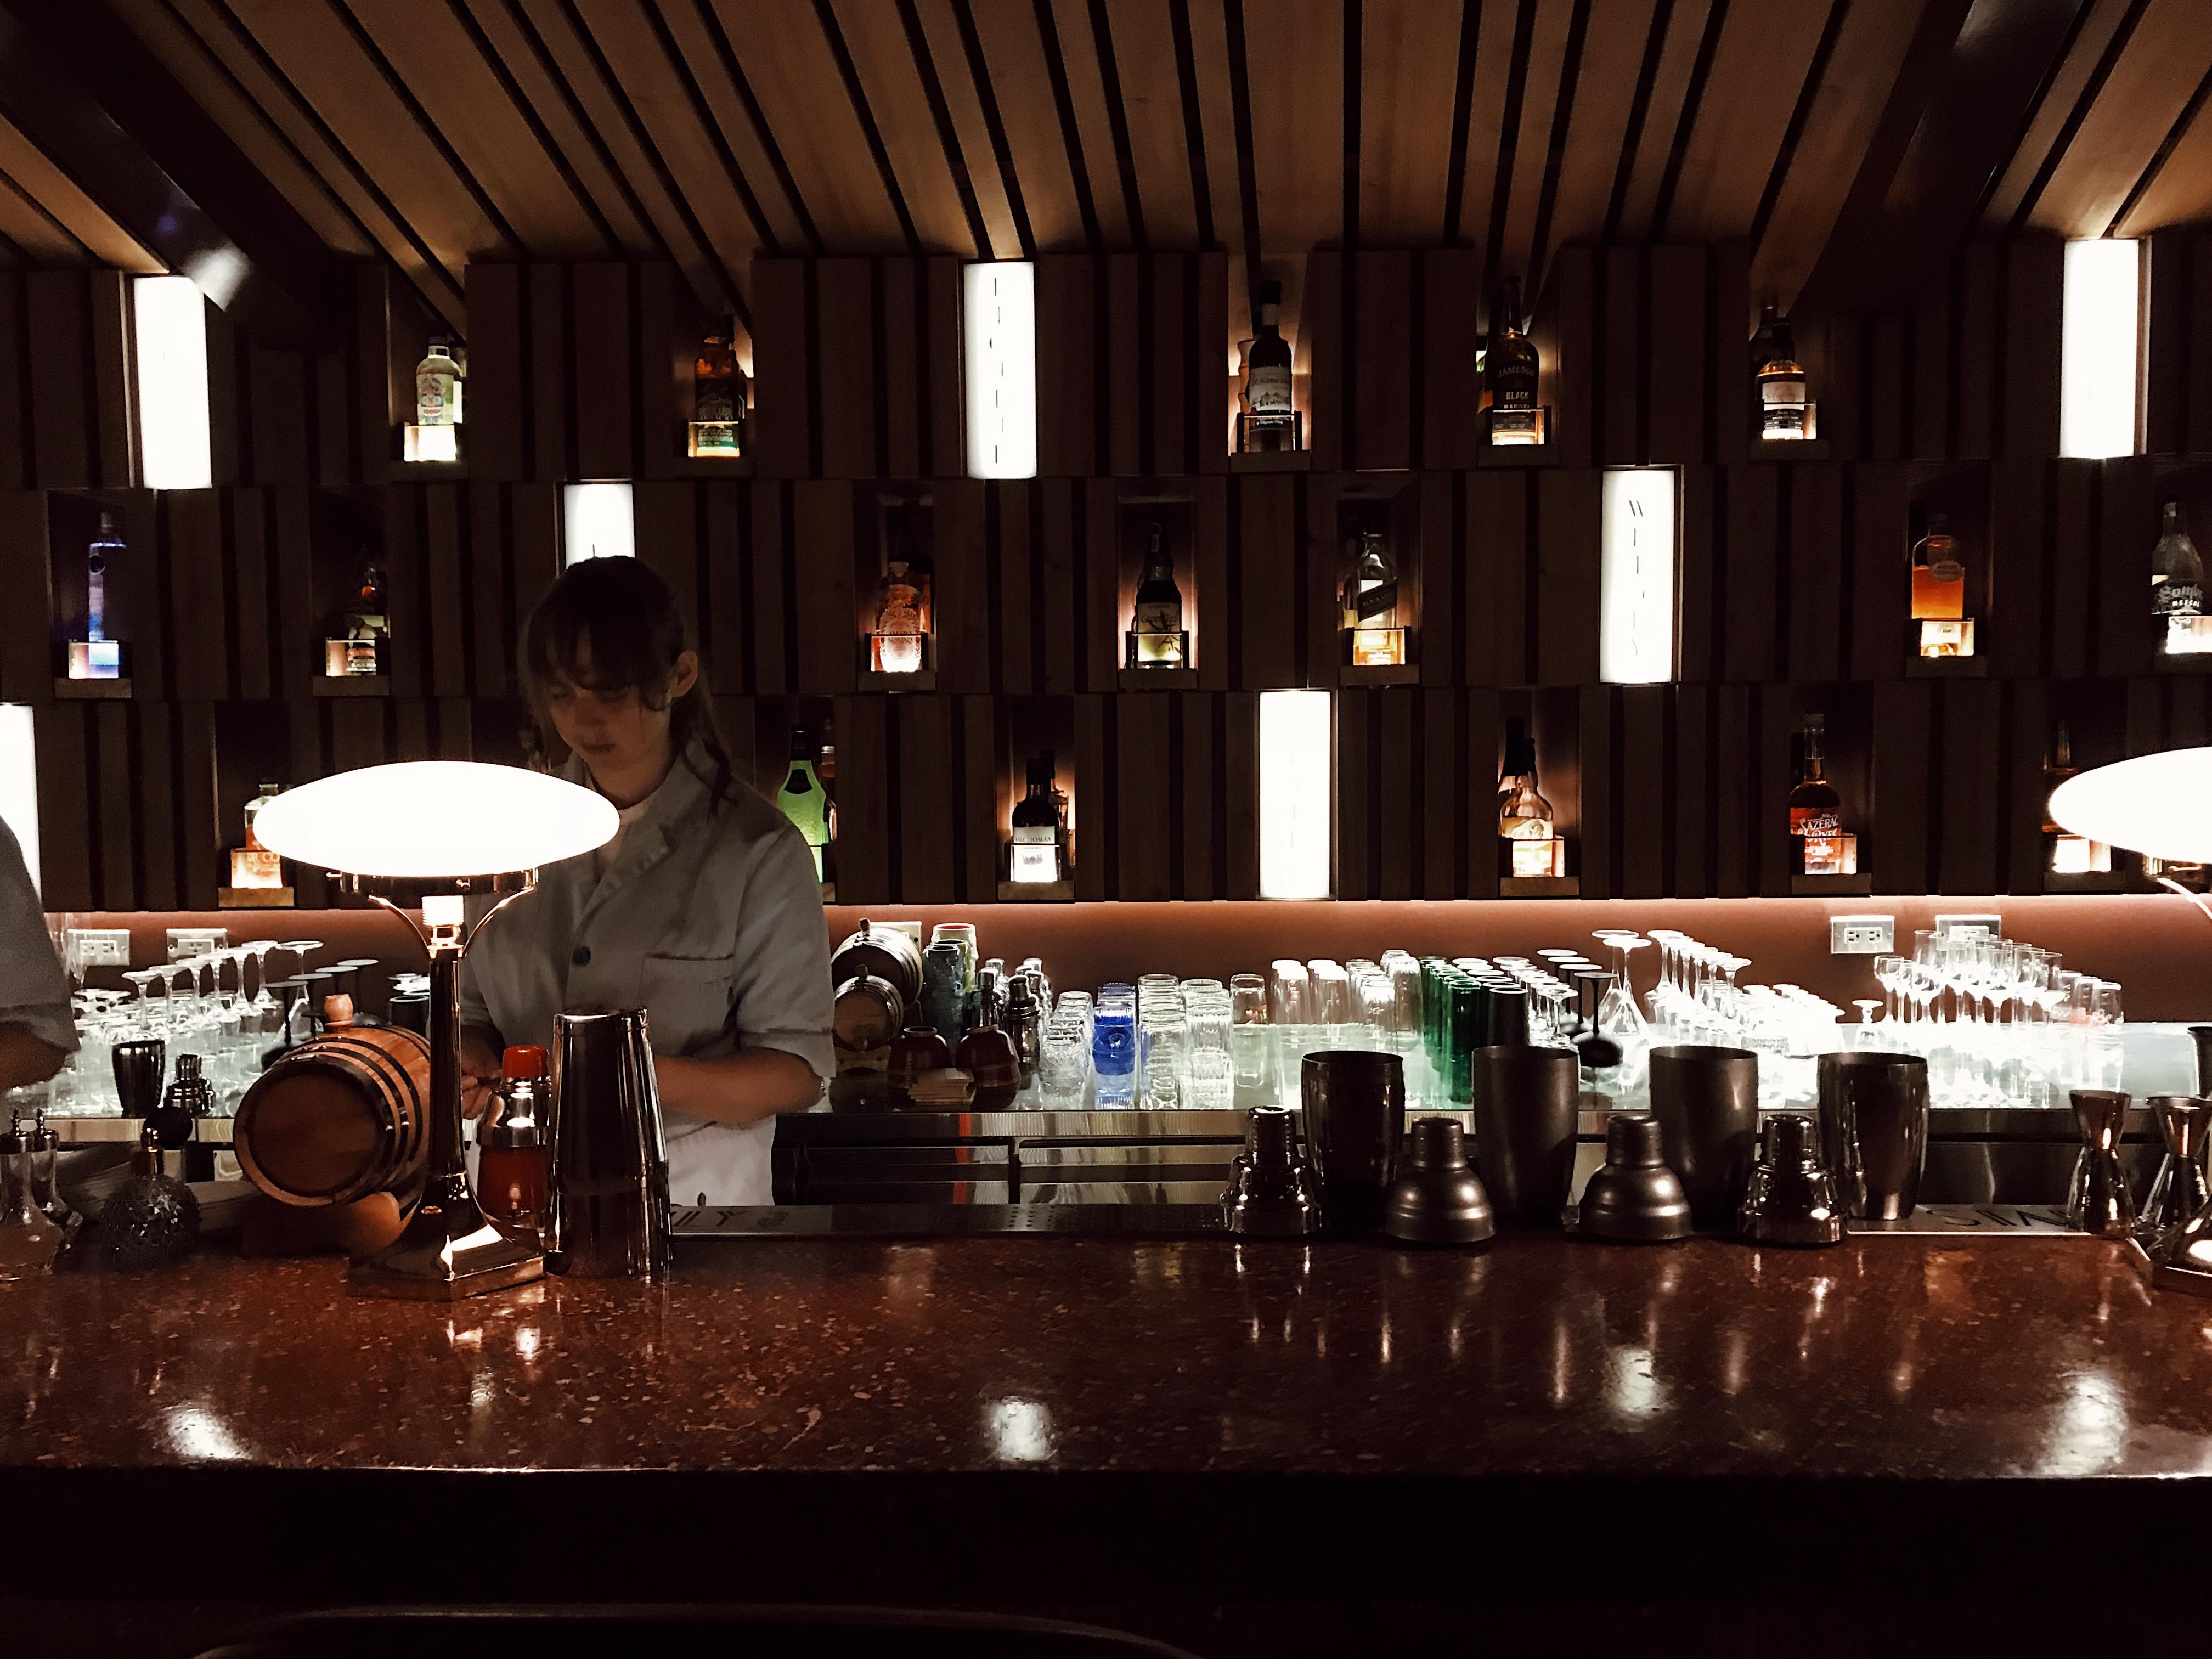 Staff Only Club 一窺台北最火的會員制酒吧